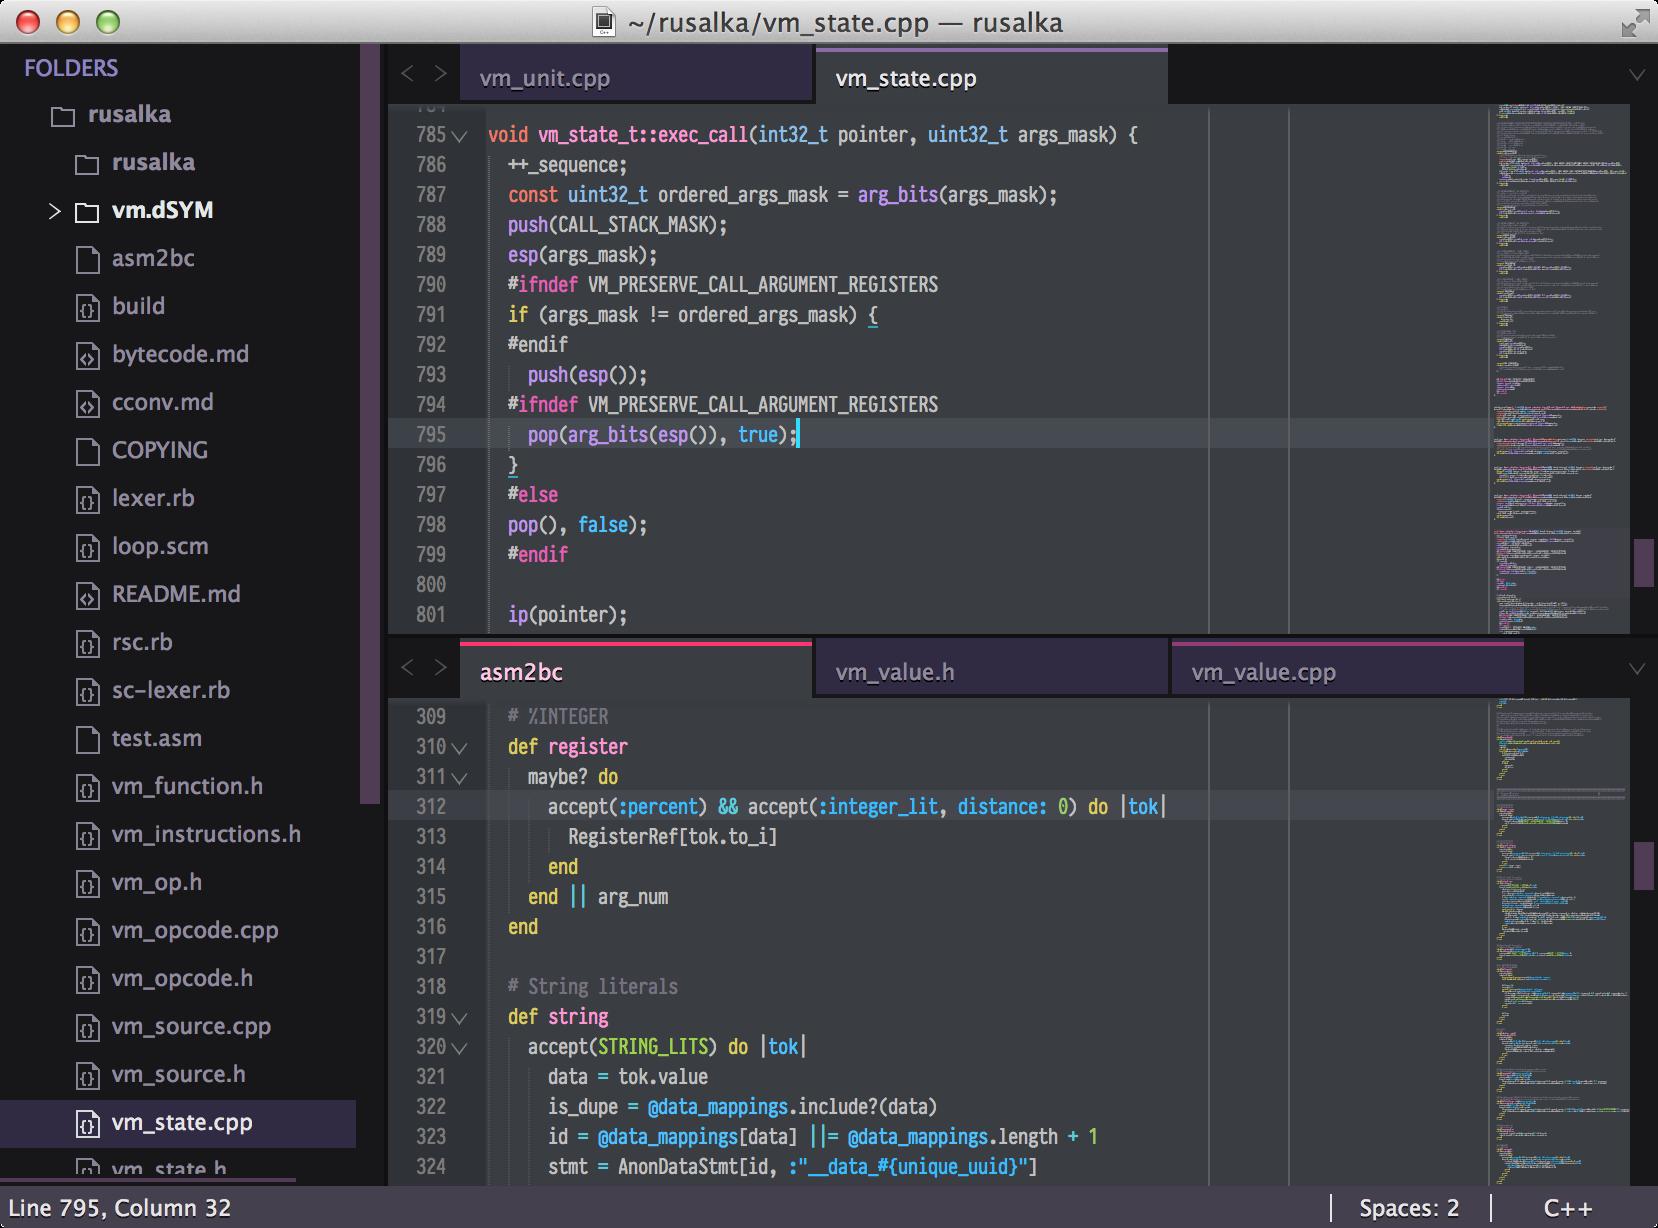 Freesia Theme Integrated development environment, Coding